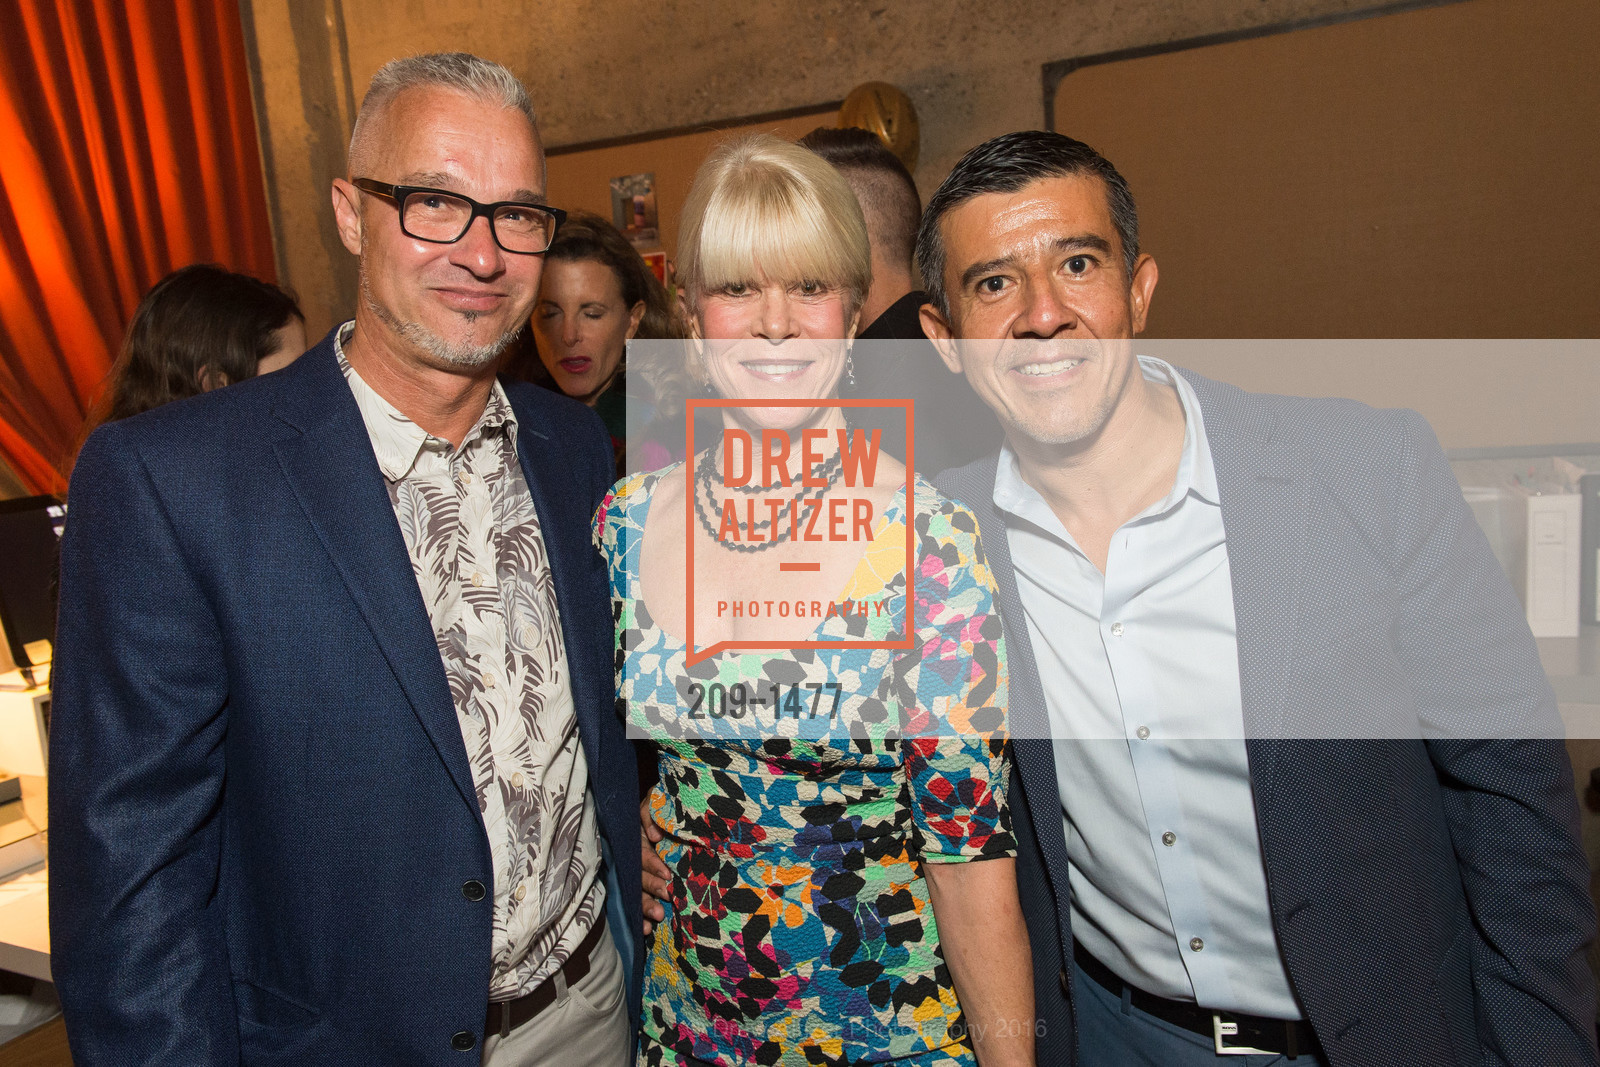 Willem Racke, Susan Chastain, Alberto Trejo, Photo #209-1477